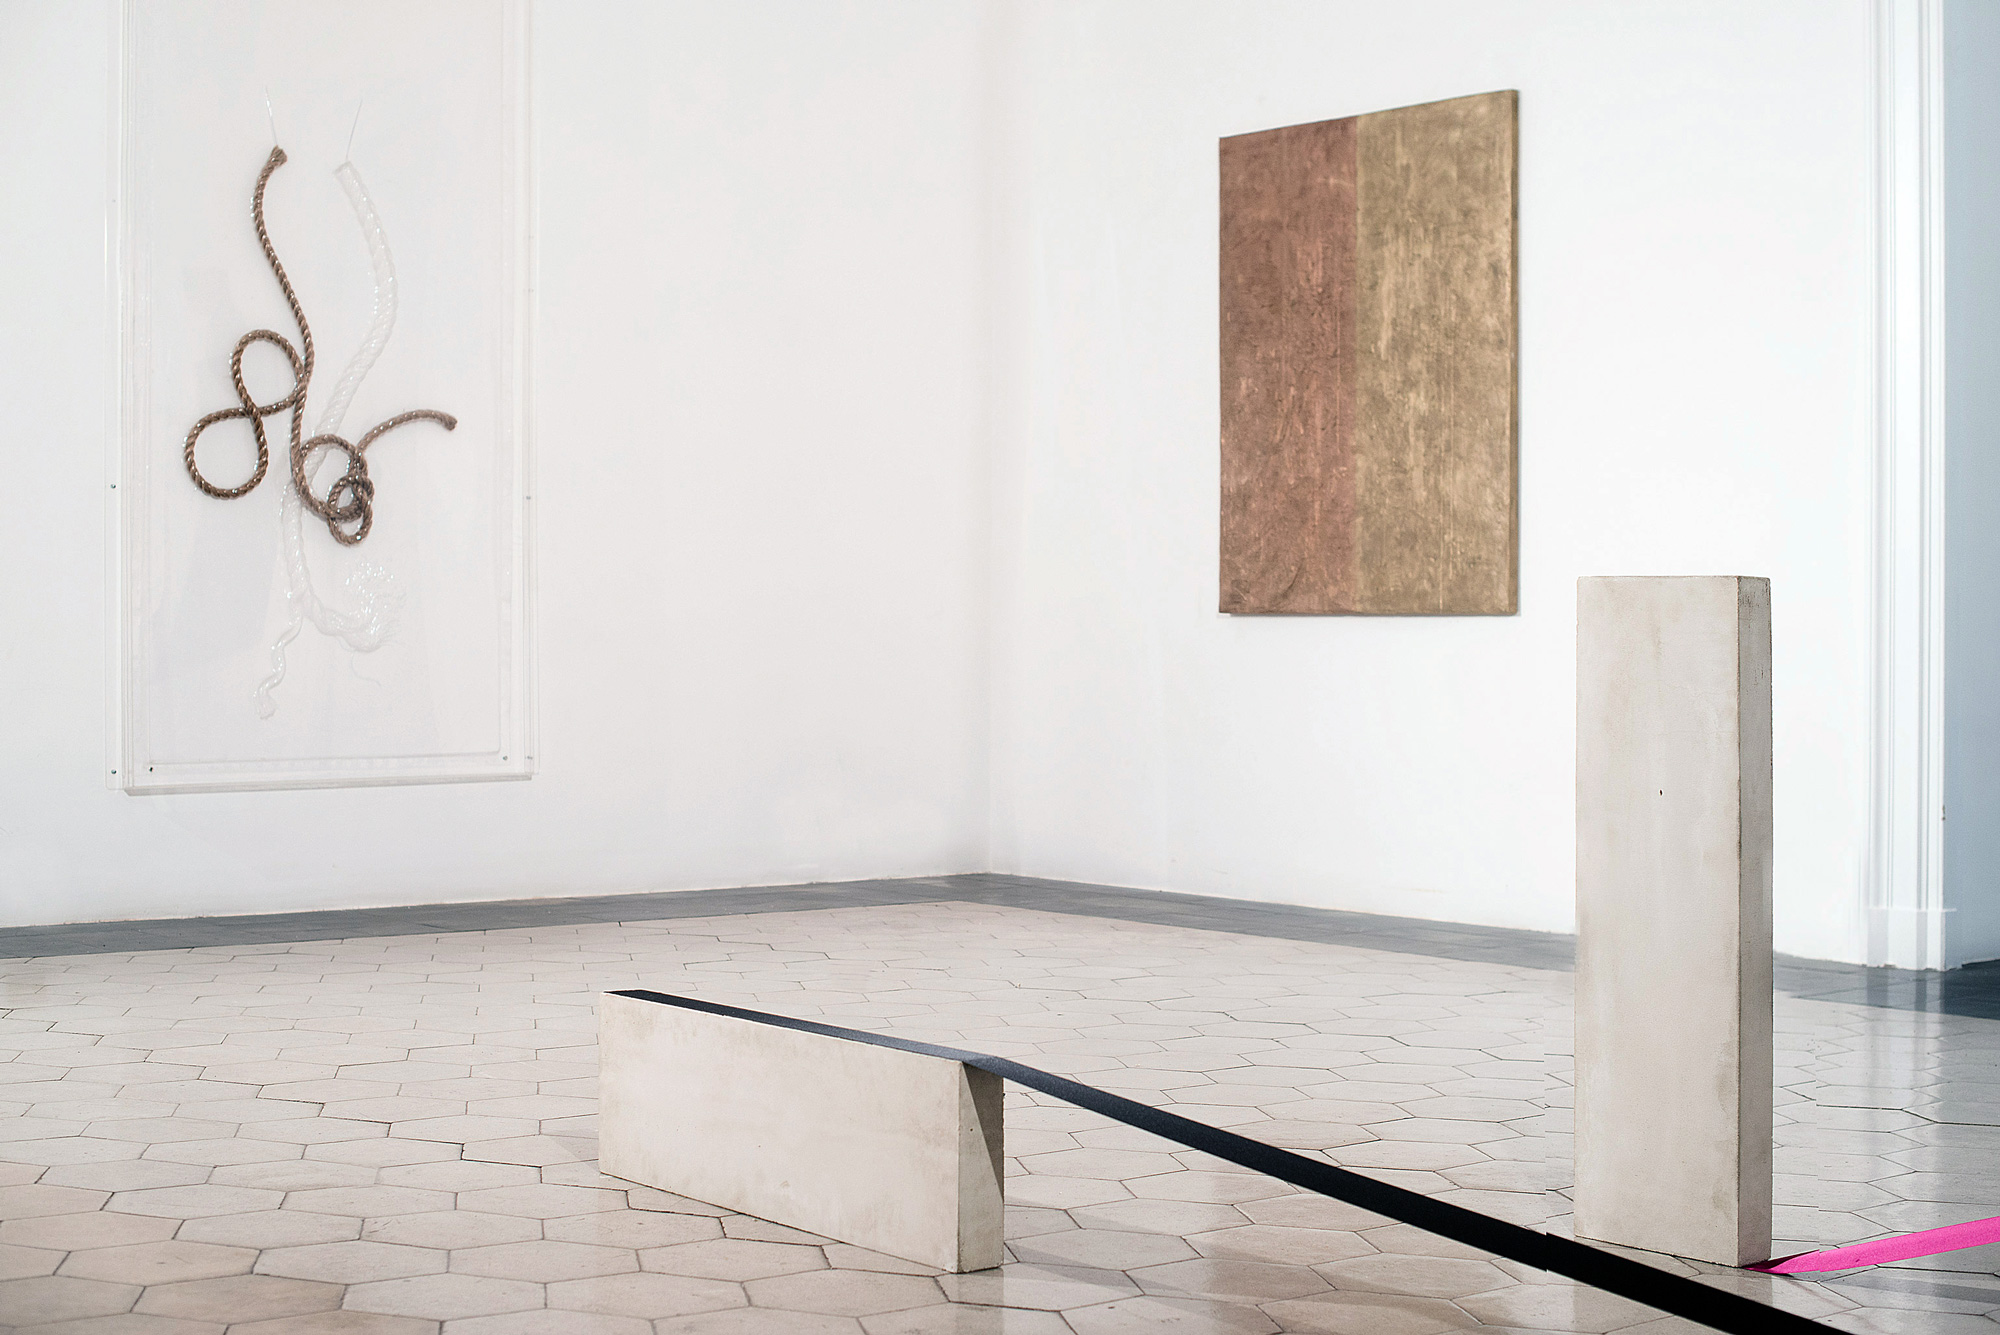 installation view (pictured with Seth Price, left; Mitzi Pederson, foreground)